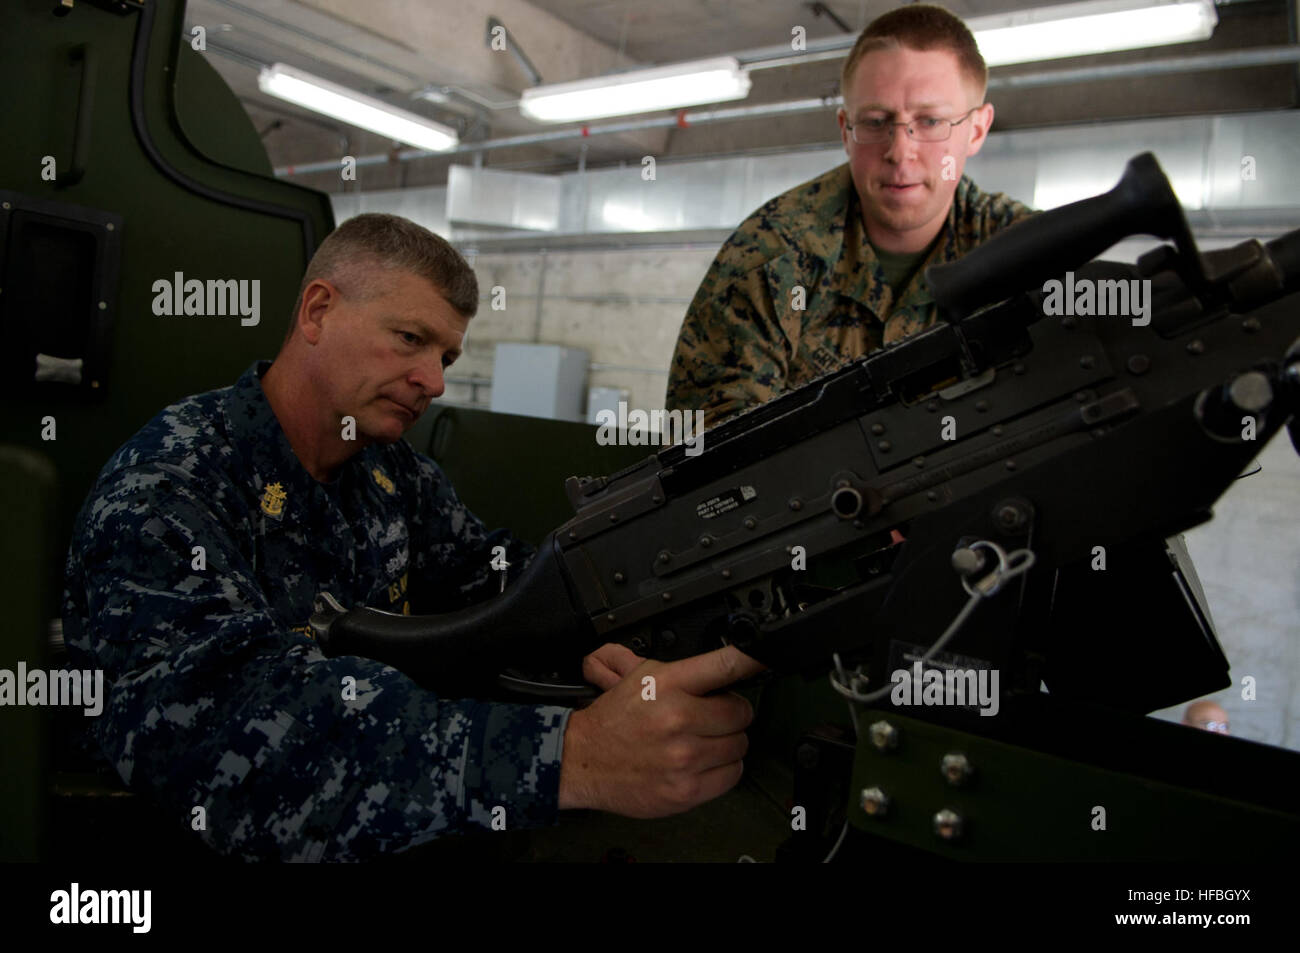 120726-N-IV546-068  BANGOR, Wash. (July 26, 2012) Lance Cpl. Justin Gresham shows Master Chief Petty Officer of - Stock Image